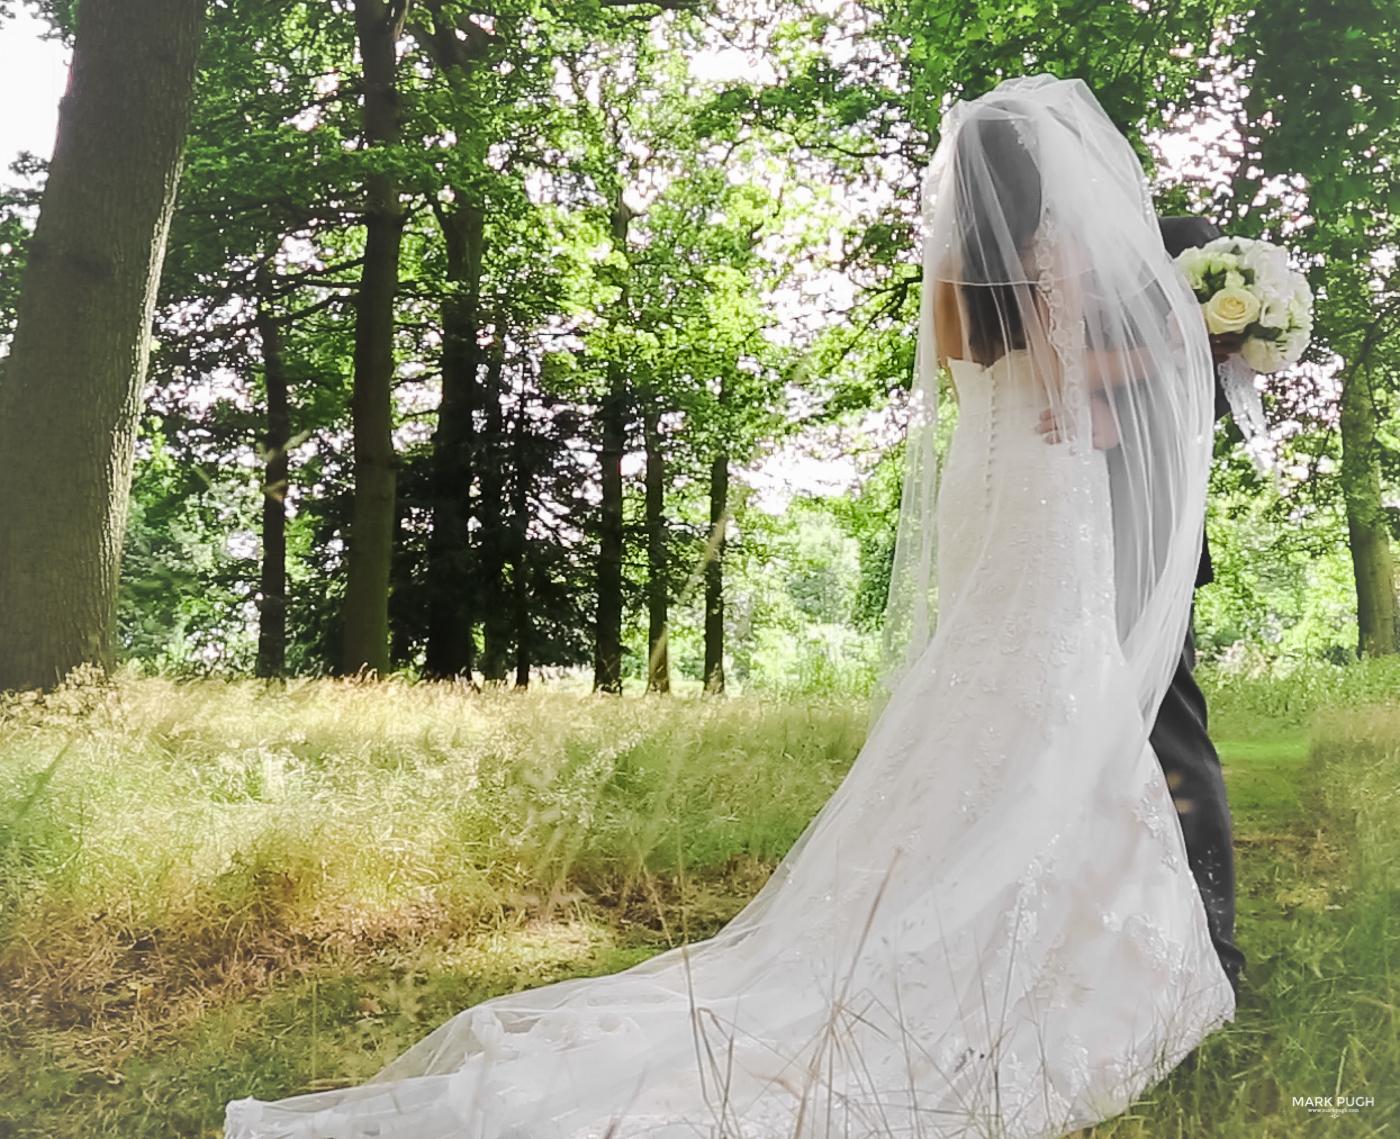 039 Wedding Photography Award winning Wedding Photographer and Videographer Mark Pugh www.markpugh.com.JPG